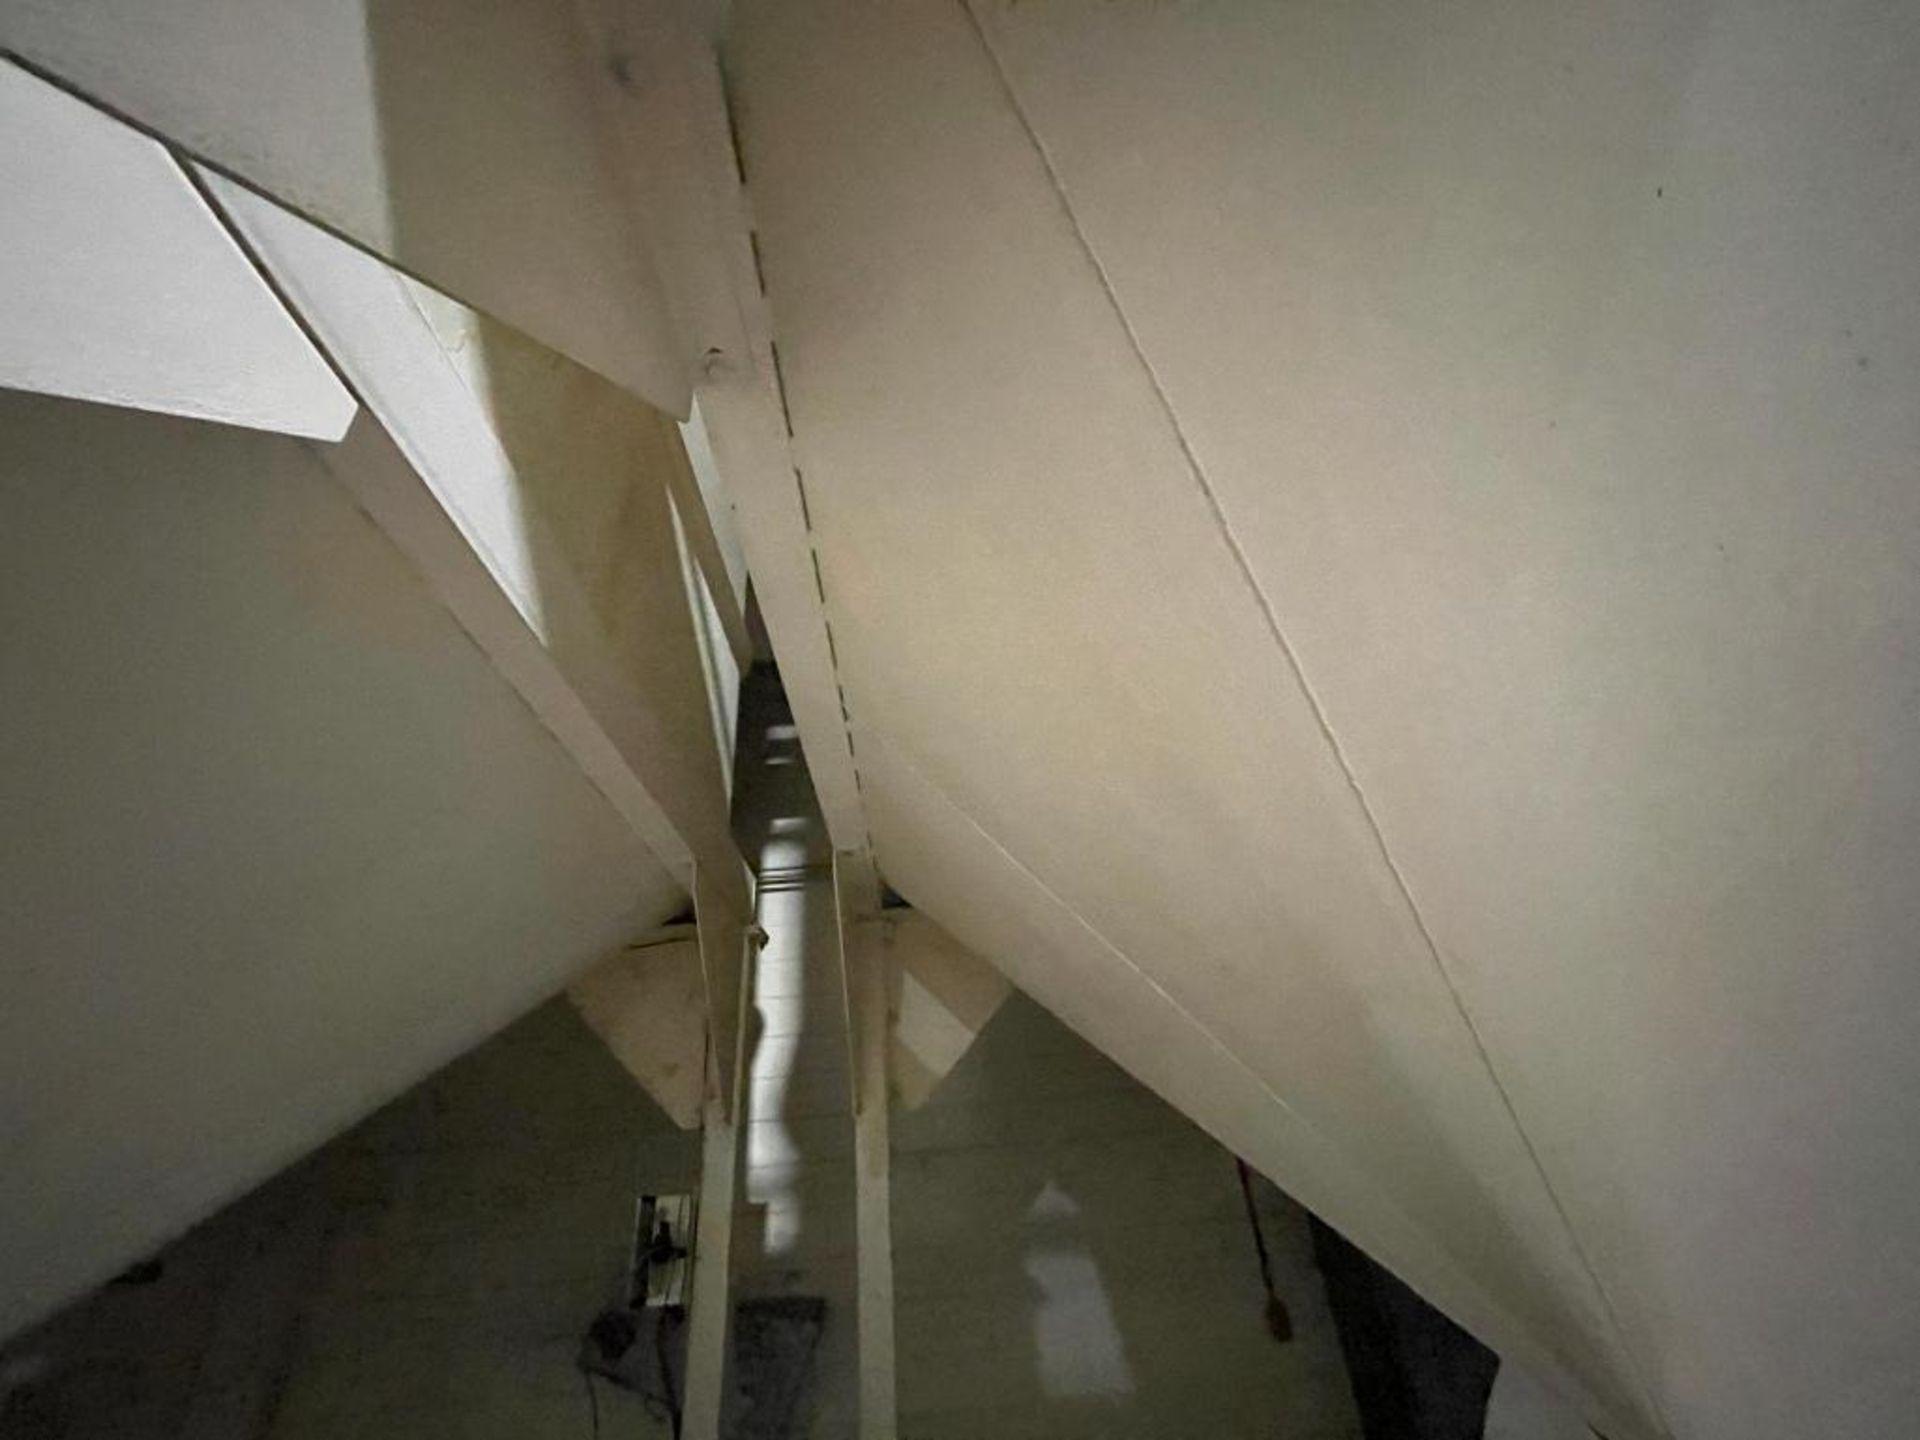 Aseeco mild steel cone bottom bulk storage bin - Image 14 of 28